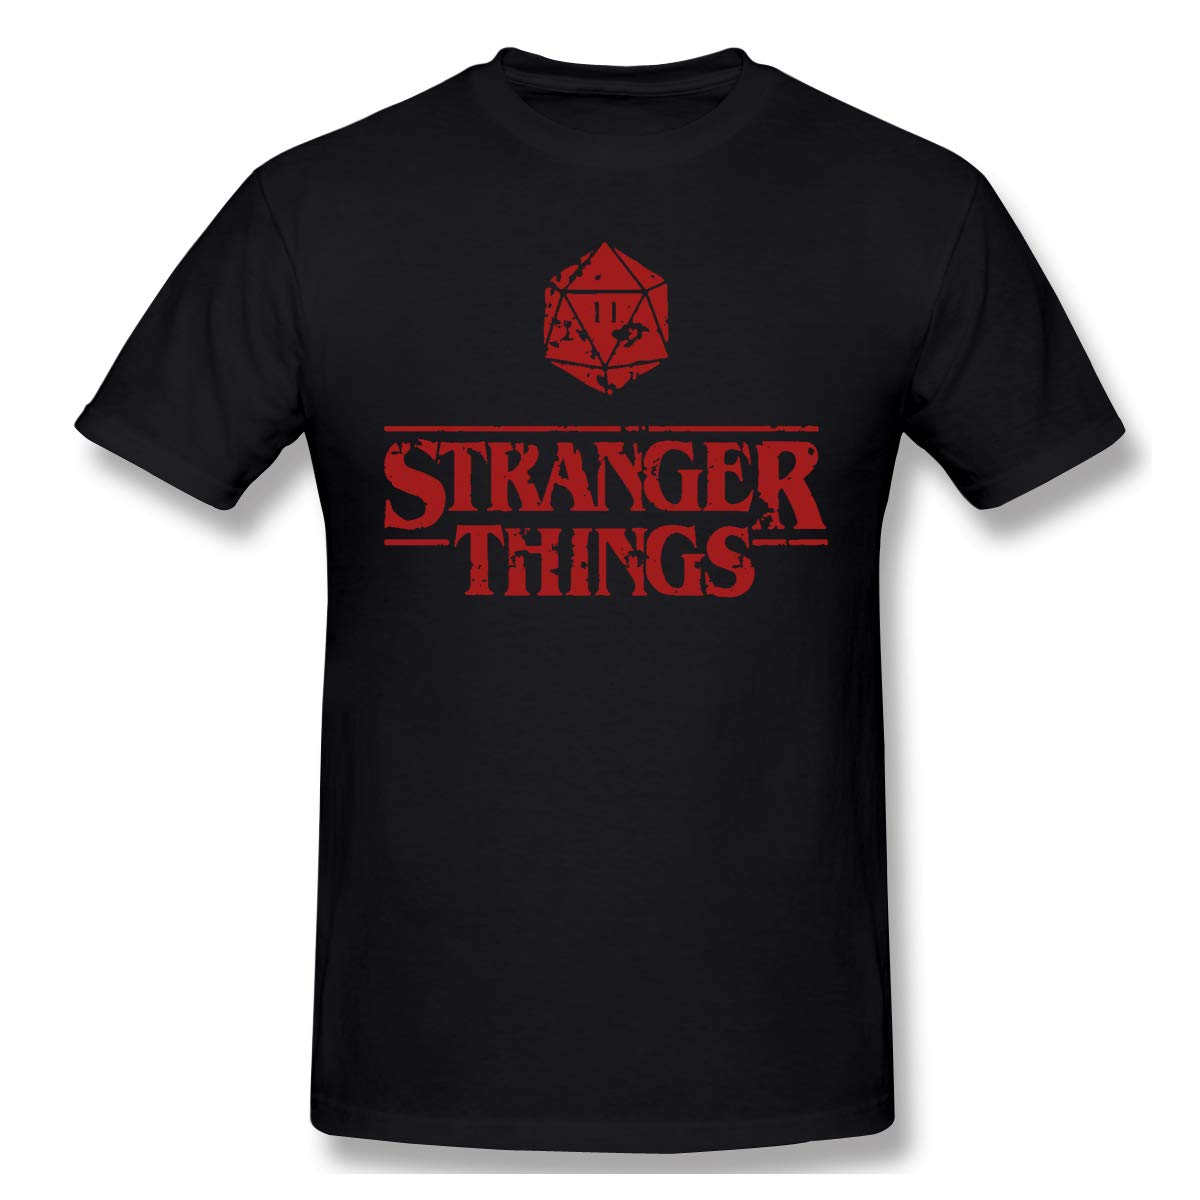 Stranger Things S Short Sleeve Tshirt Novelty Crewneck Athletic Tee Black